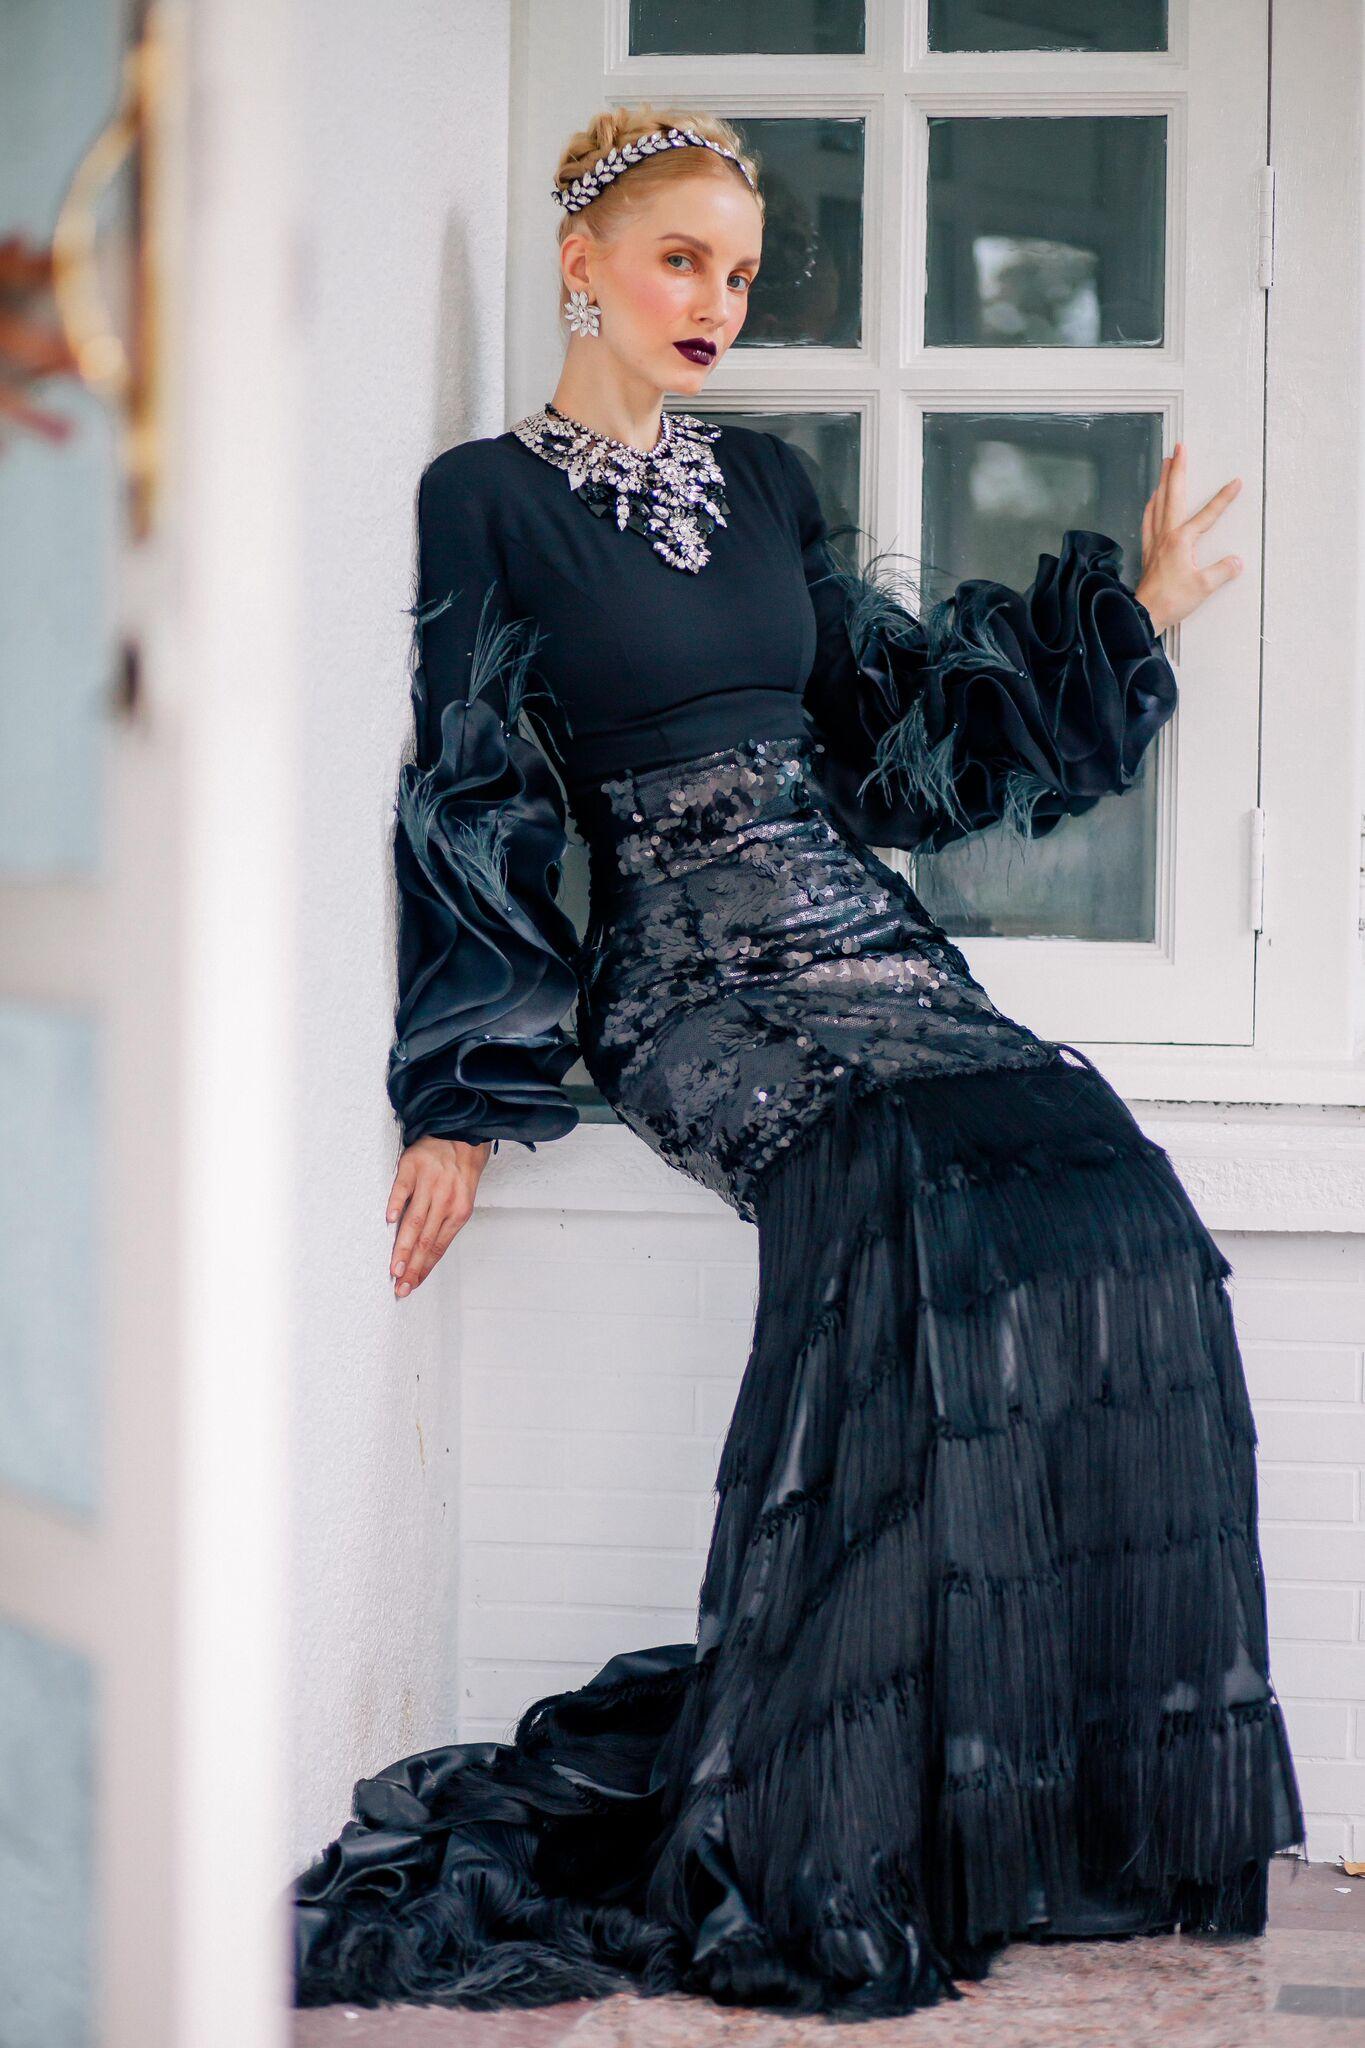 page 4 - model black dress.jpg